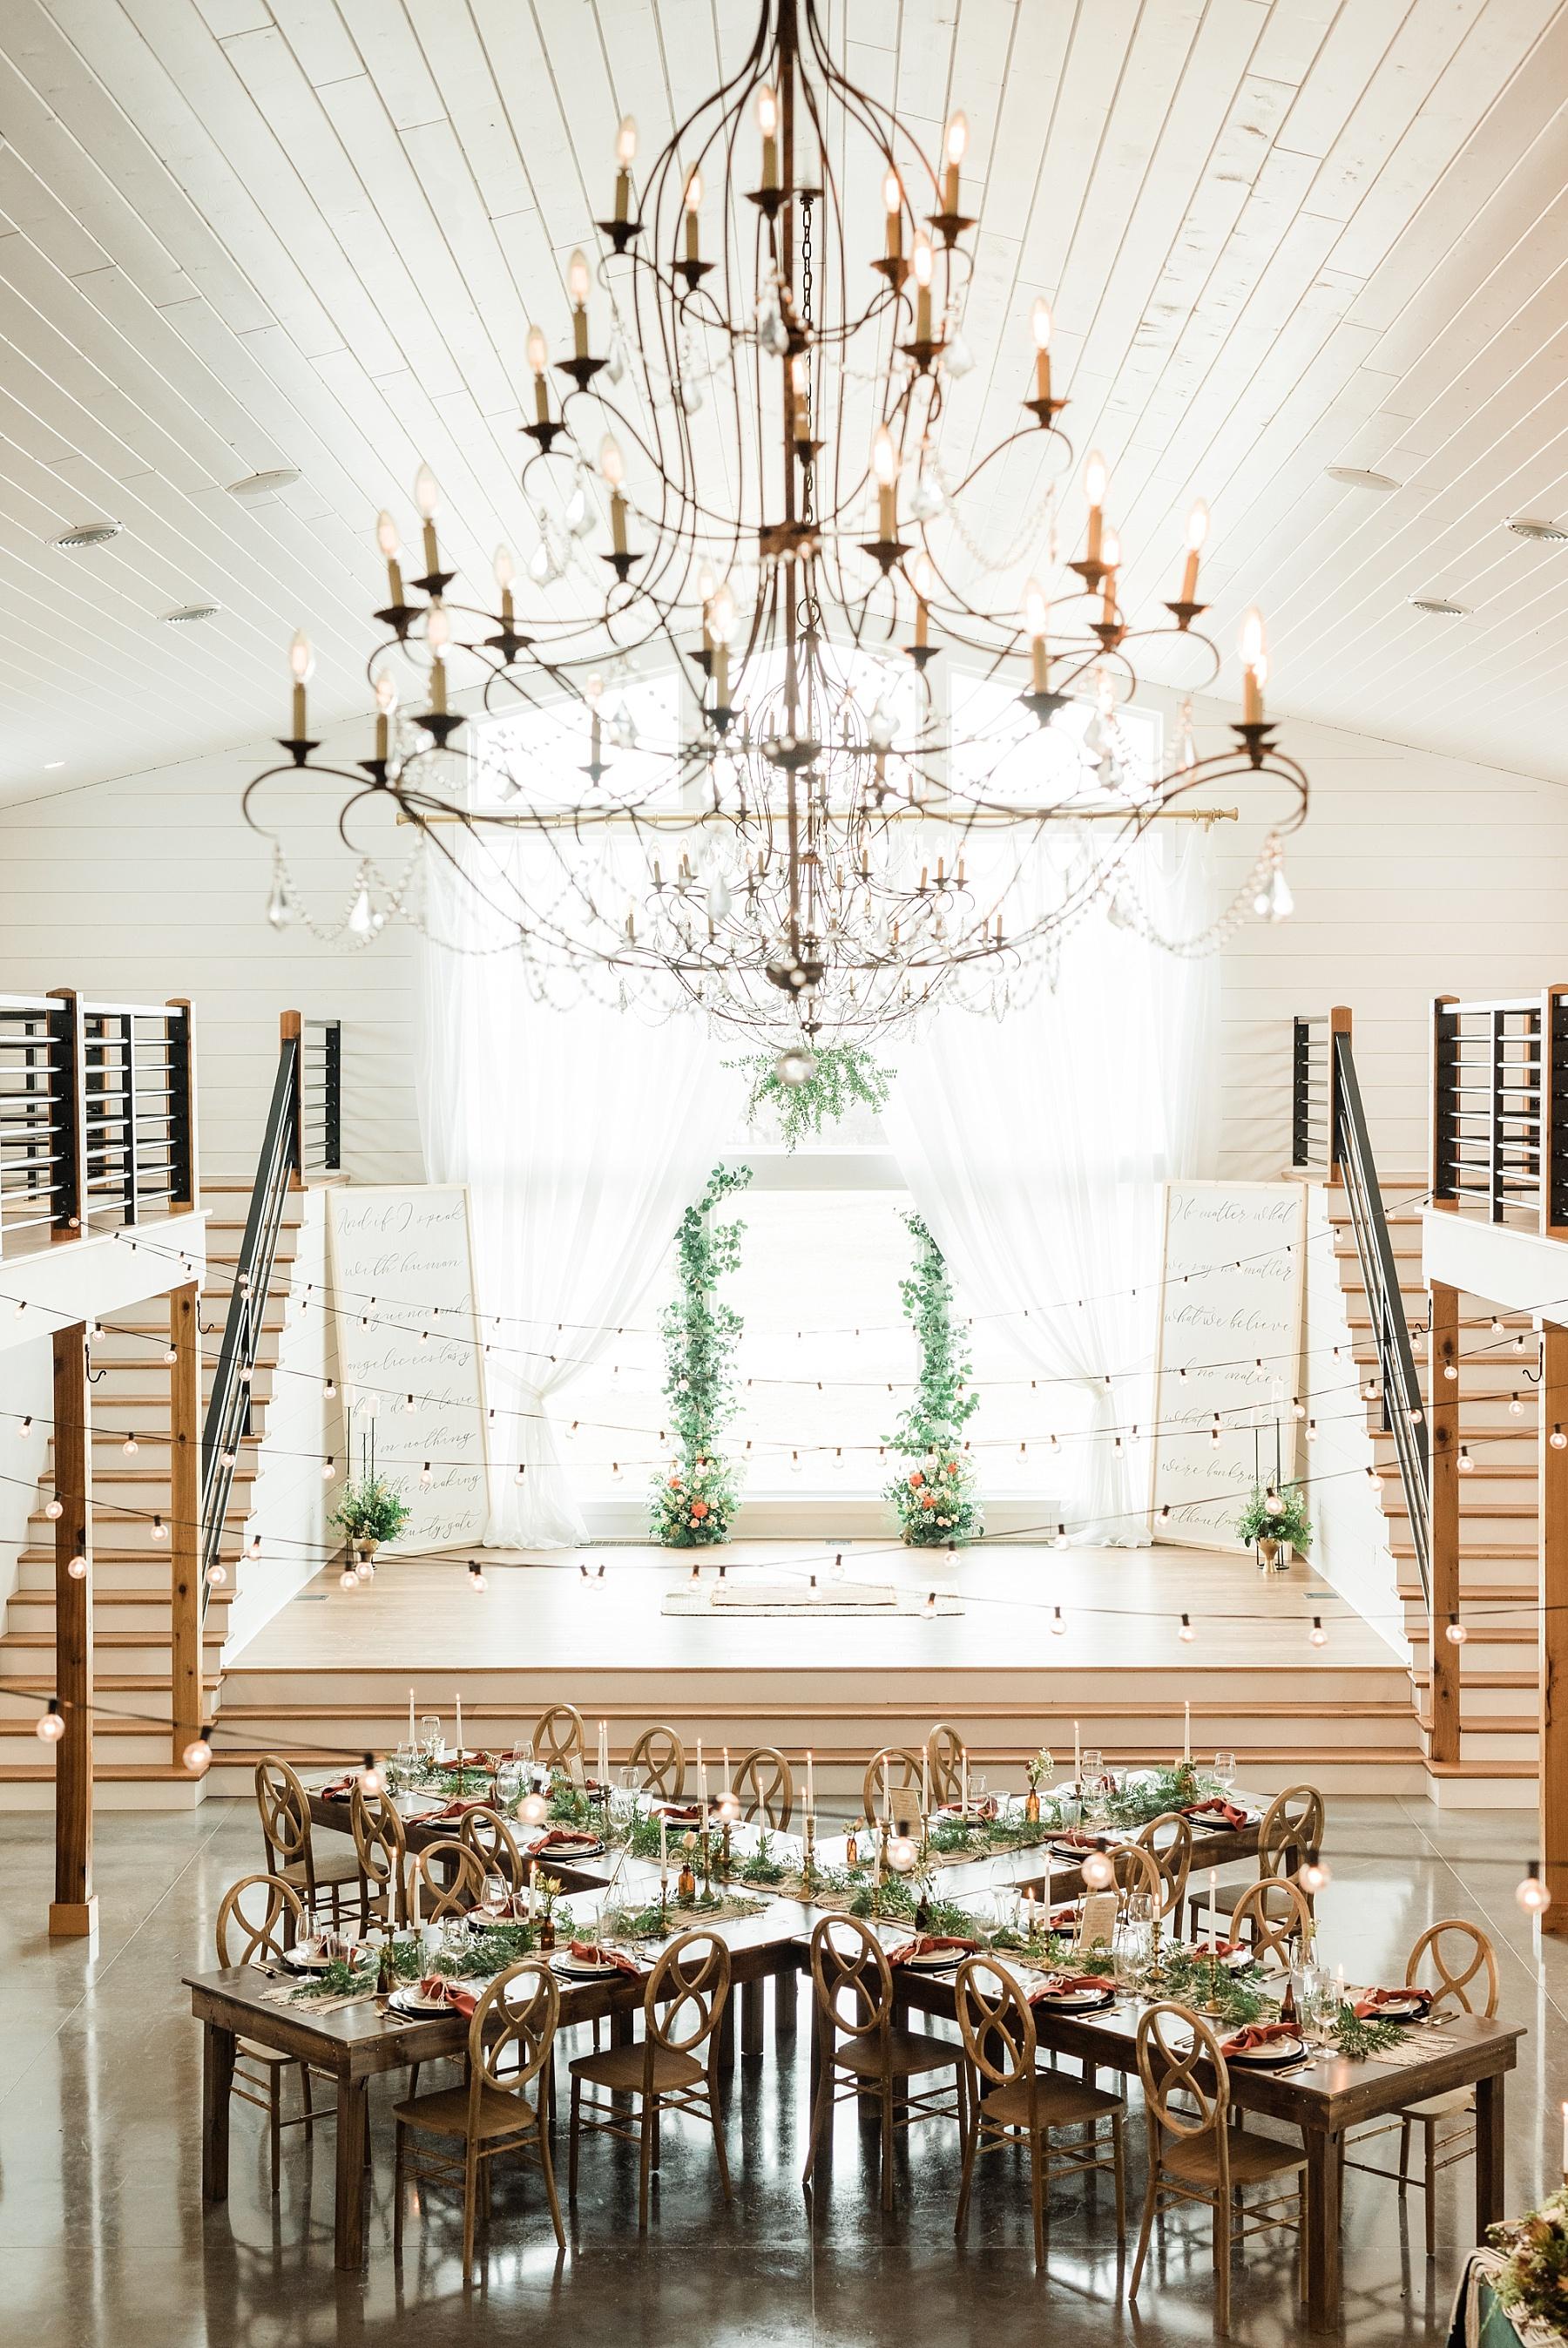 Eclectic Scandinavian Winter Wedding in All White Venue Emerson Fields by Kelsi Kliethermes Photography Best Missouri and Maui Wedding Photographer_0087.jpg